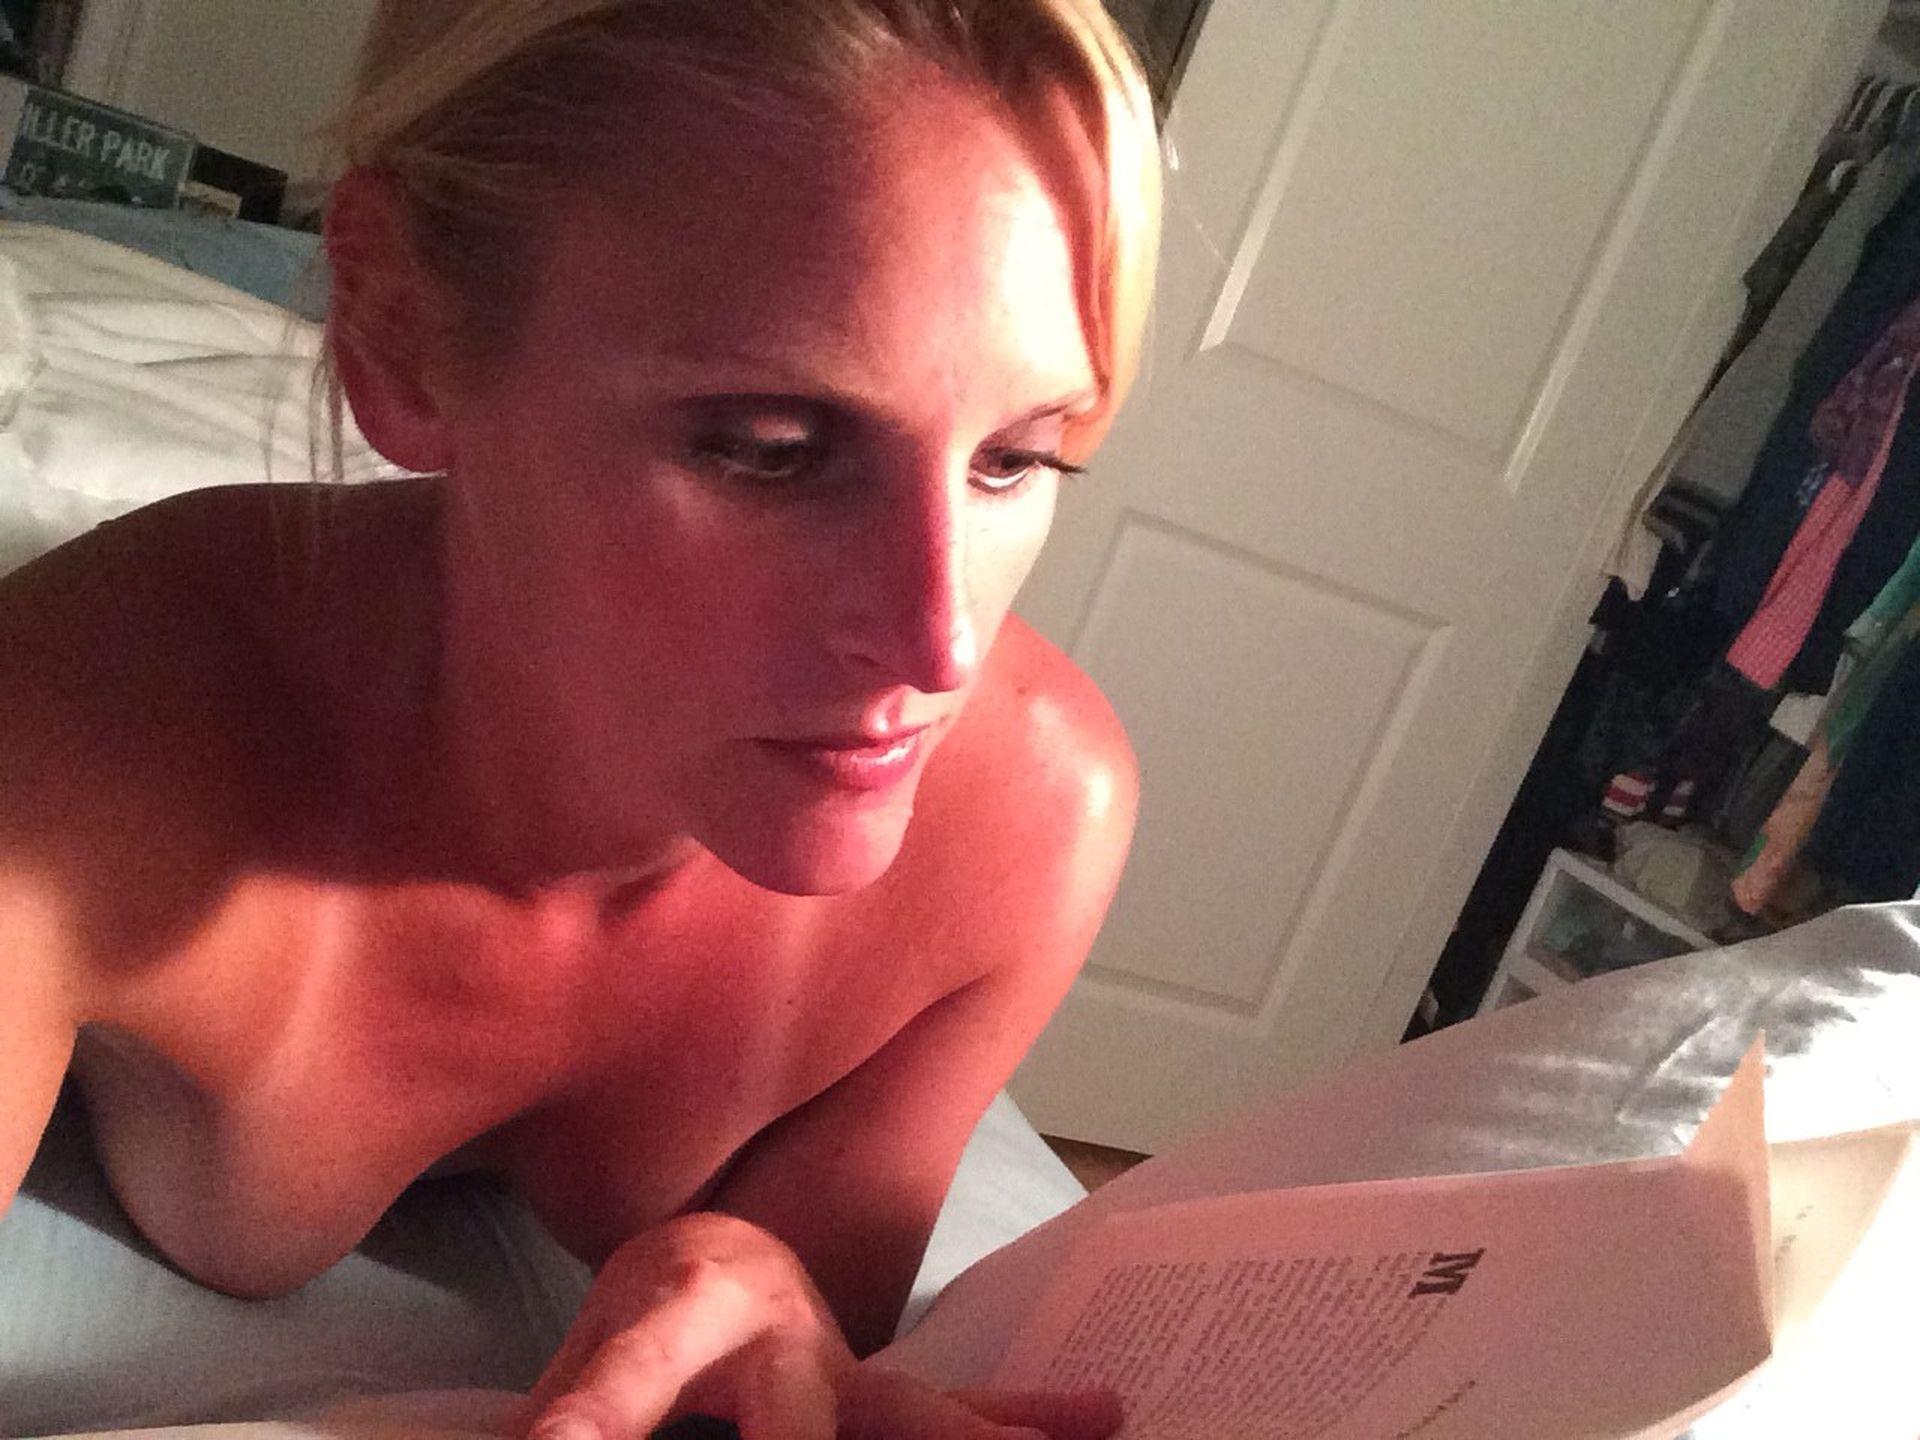 Trenni Kusnierek Nude Leaked The Fappening 8 Thefappeningblog.com1